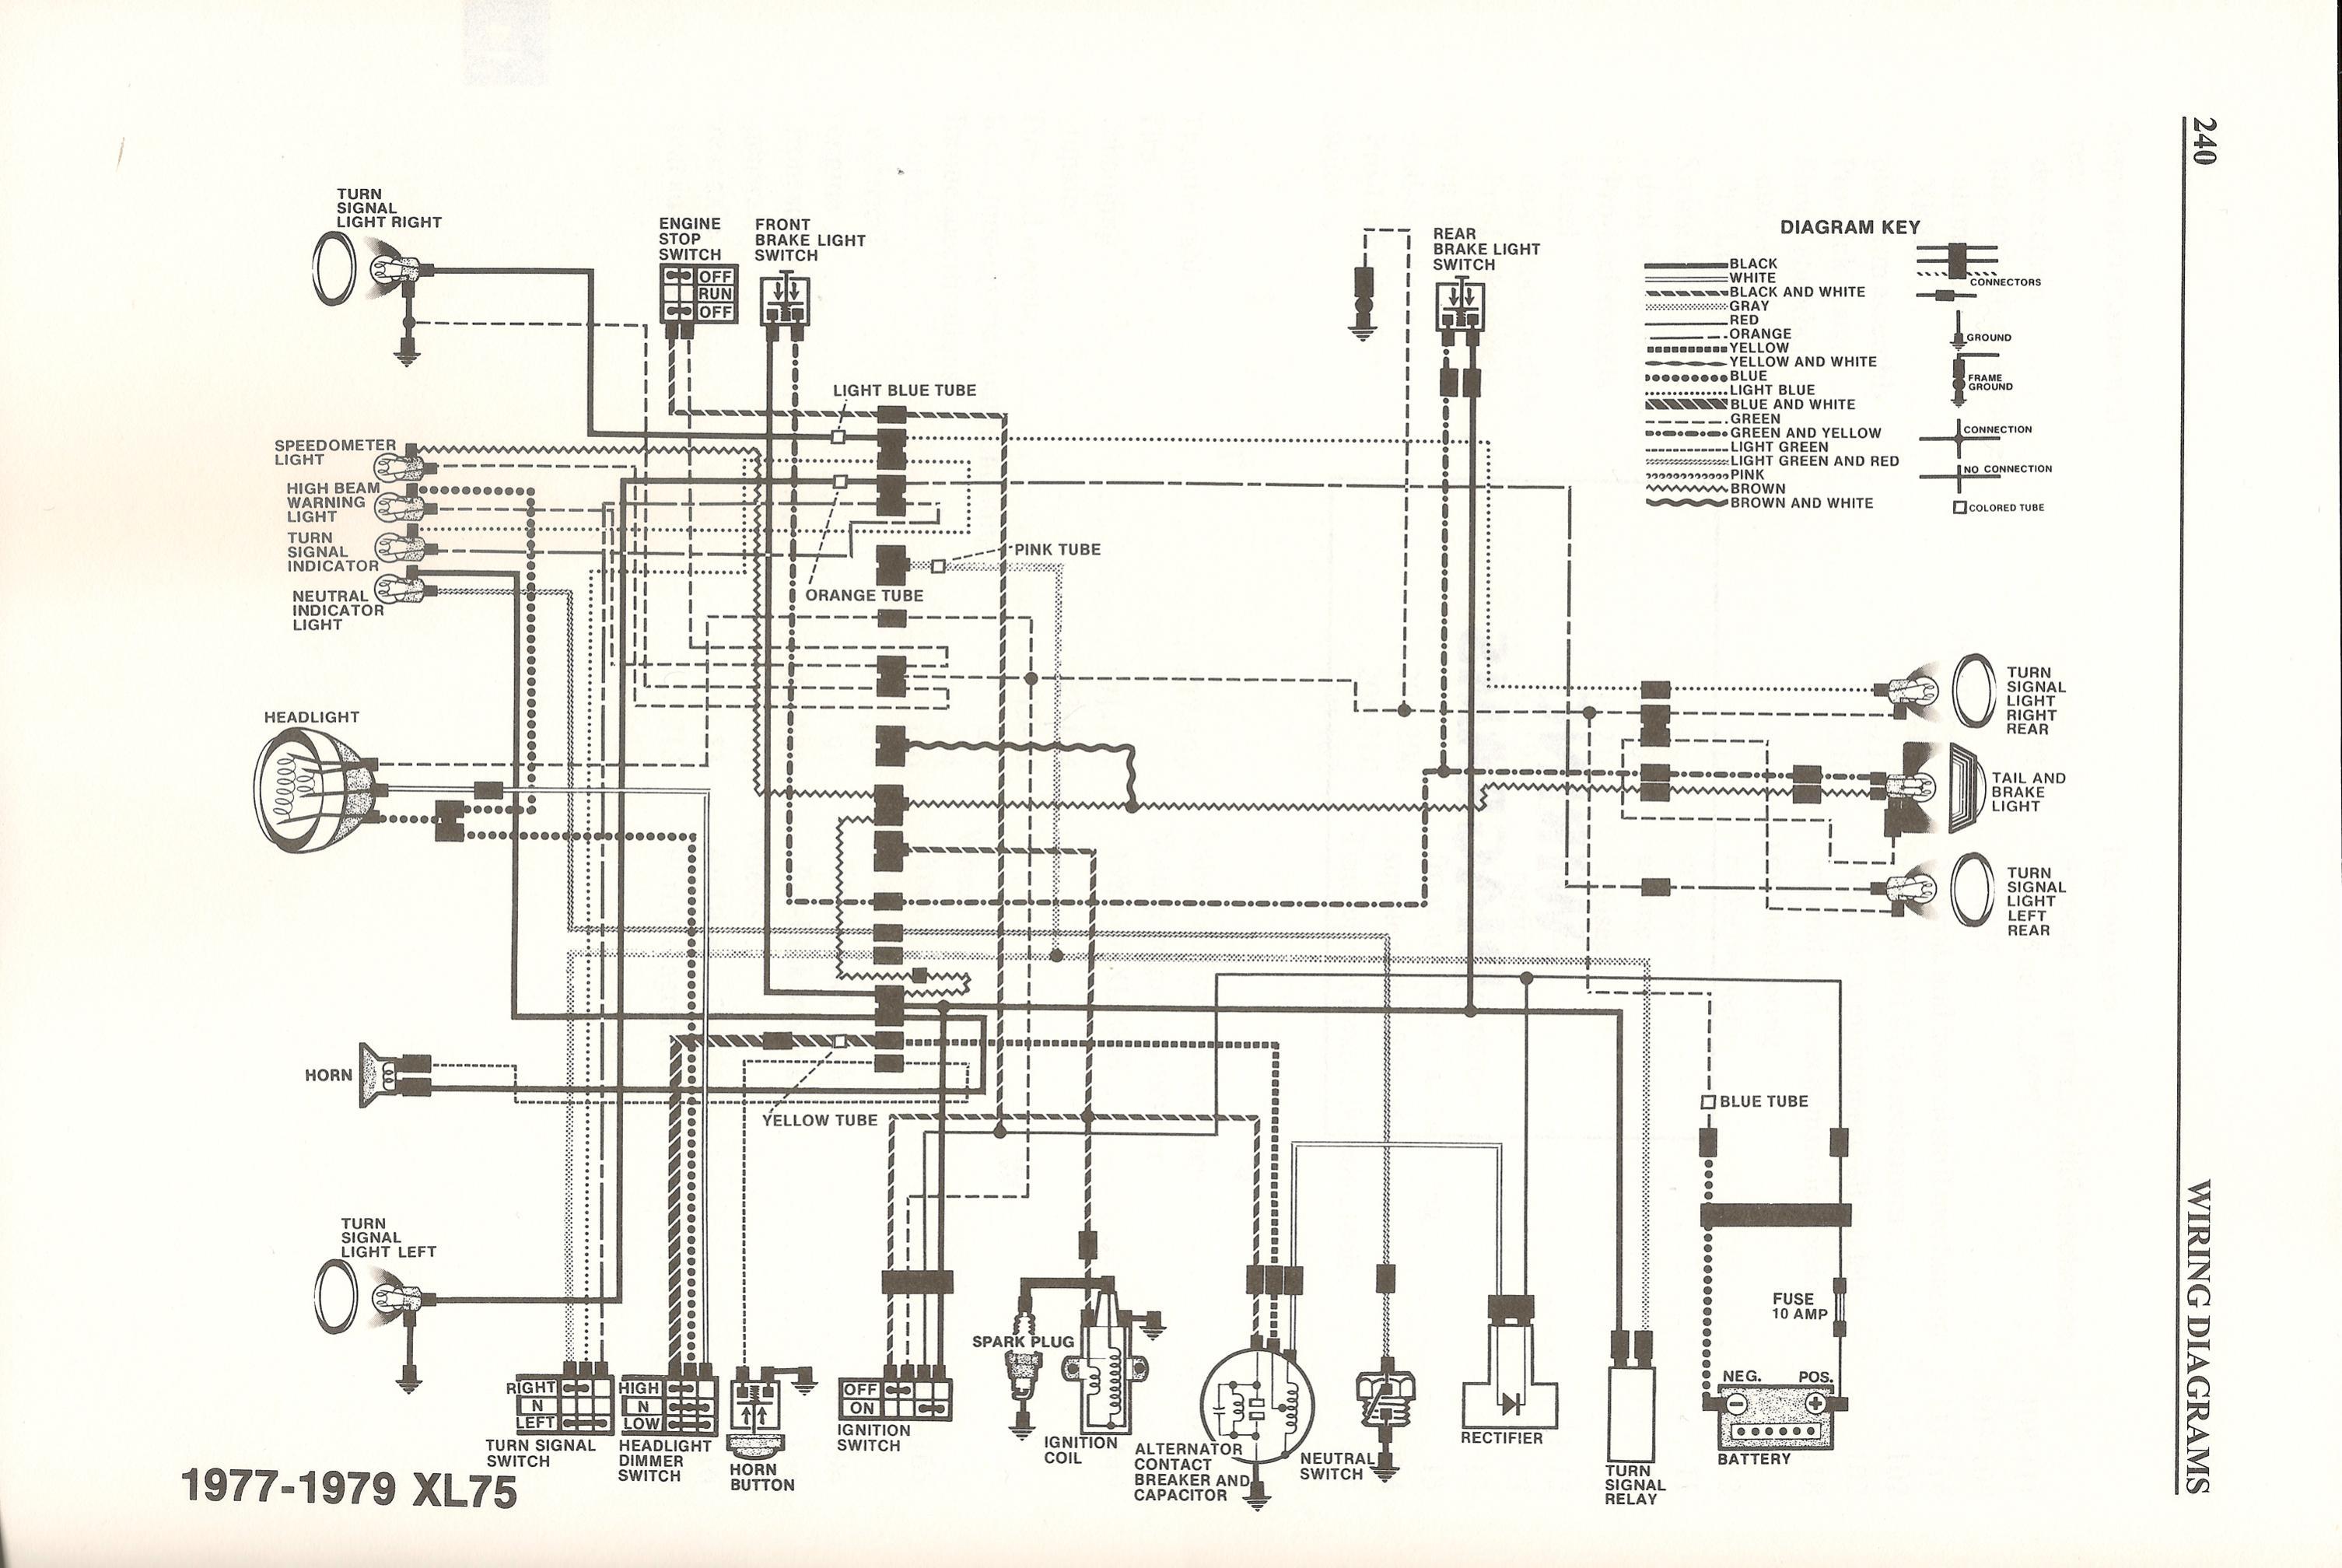 1977 honda xl75 stator page 2 name 1977 79 xl75 wiring schematicg swarovskicordoba Choice Image